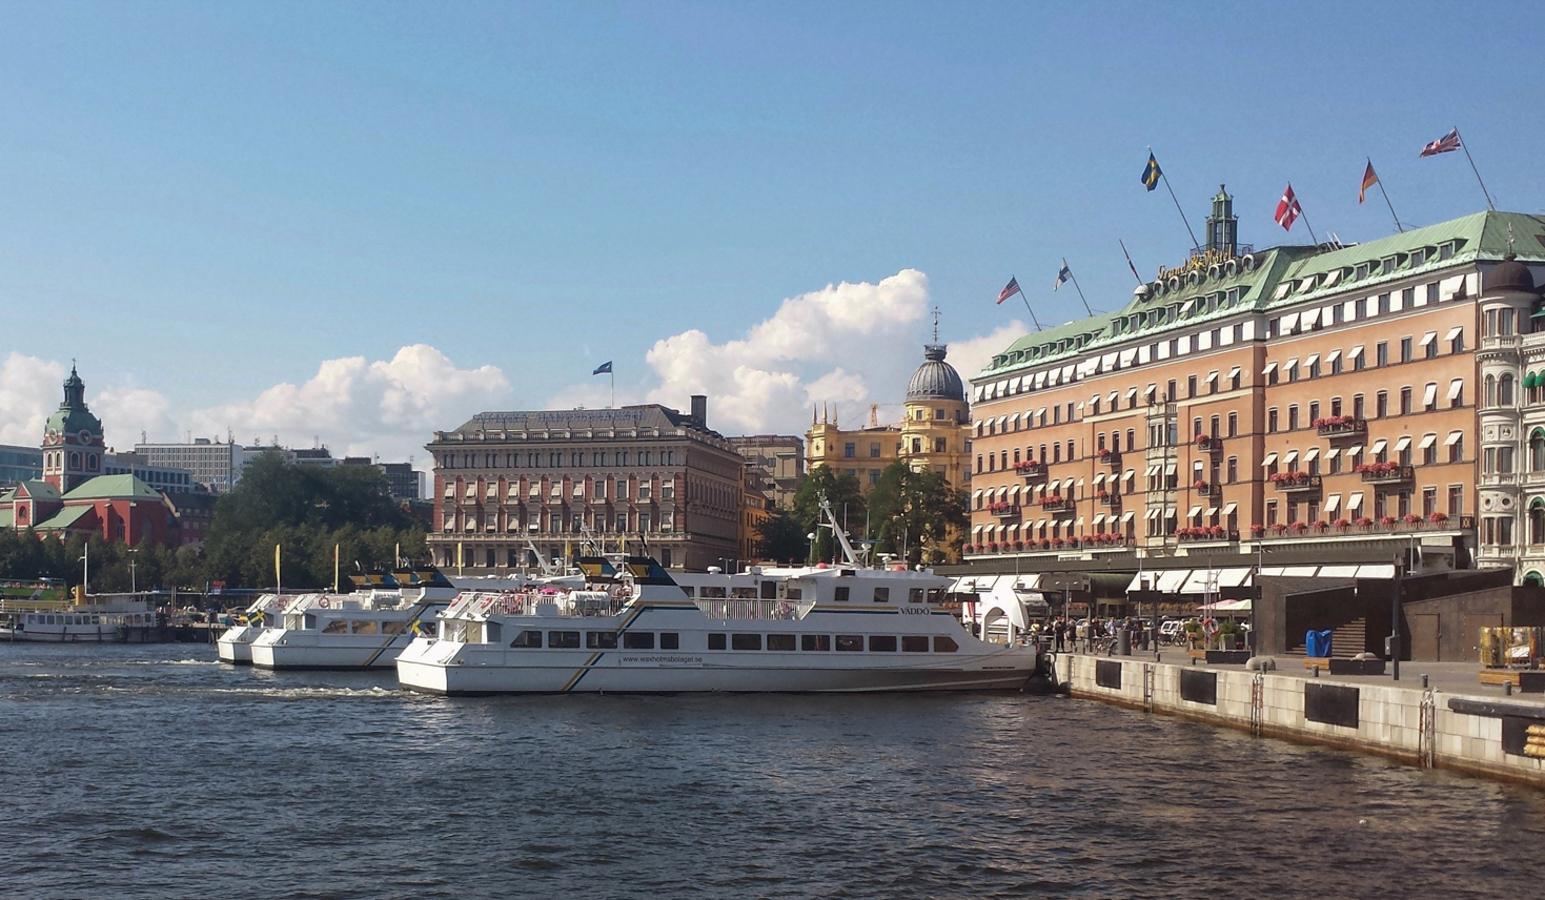 Stockholms skjærgård